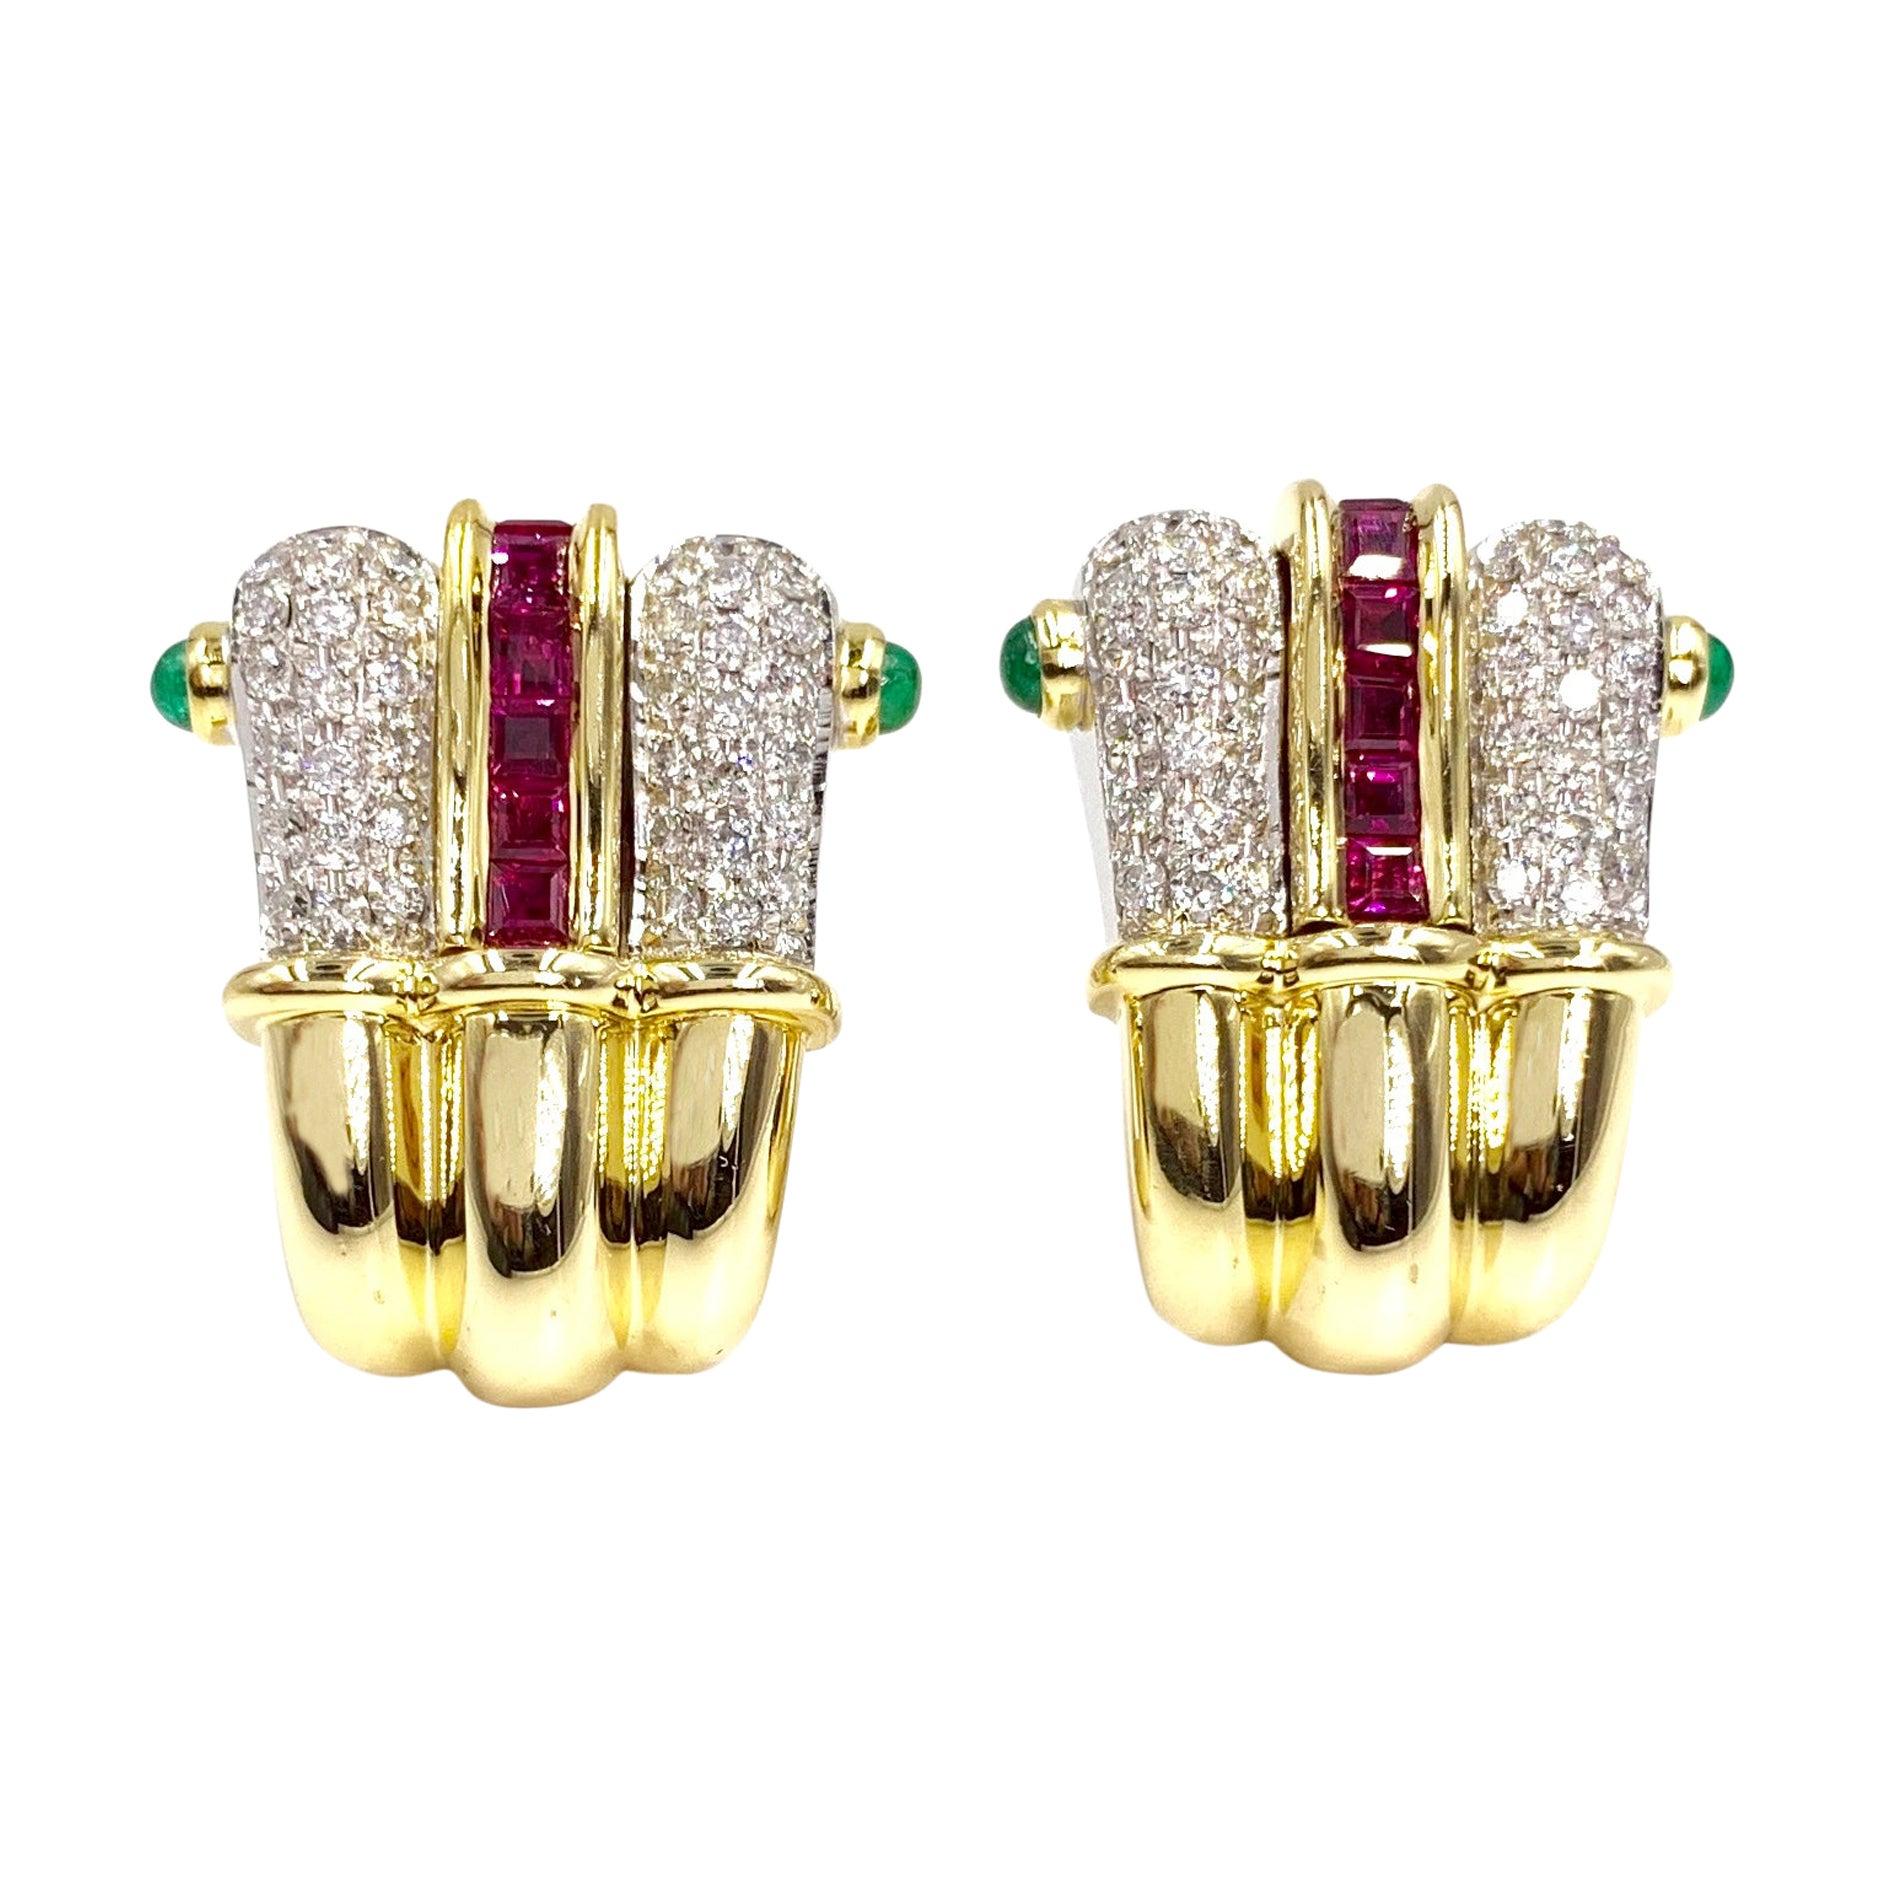 18 Karat Ruby, Diamond and Emerald Earrings